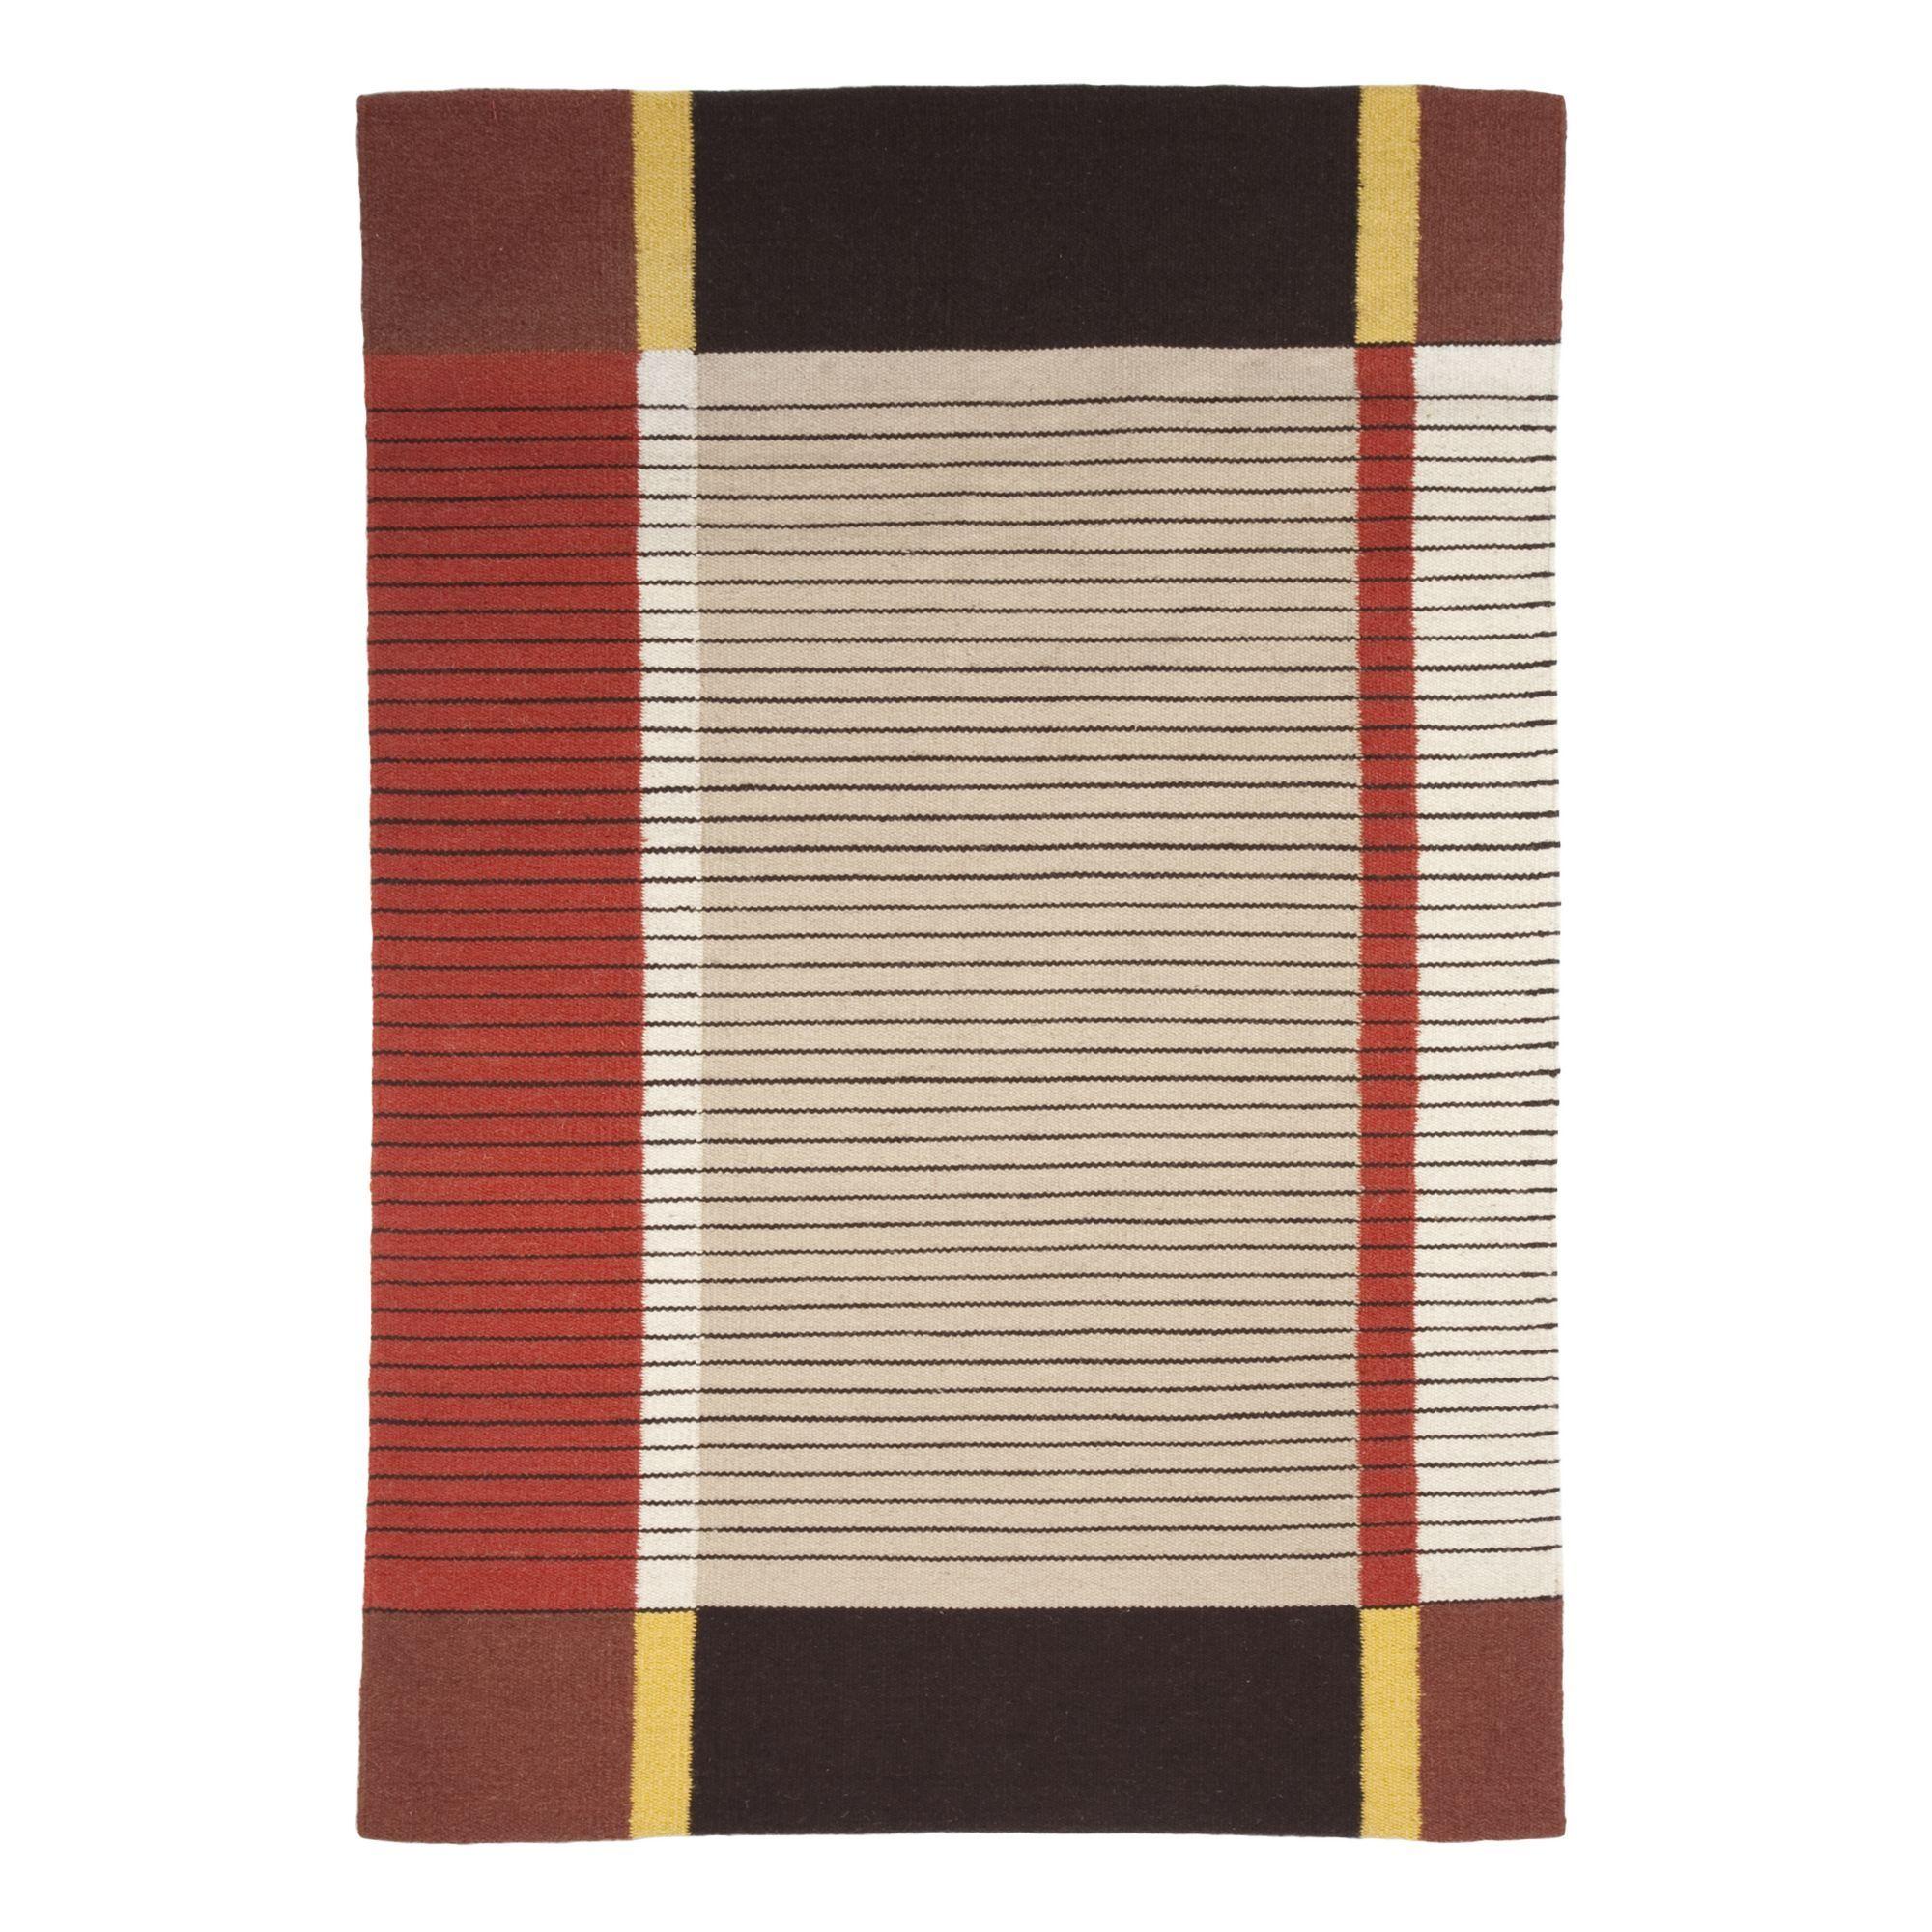 Tapis En Laine 120x180cm Tibet Kilim Tapis Textiles Tapis Salon